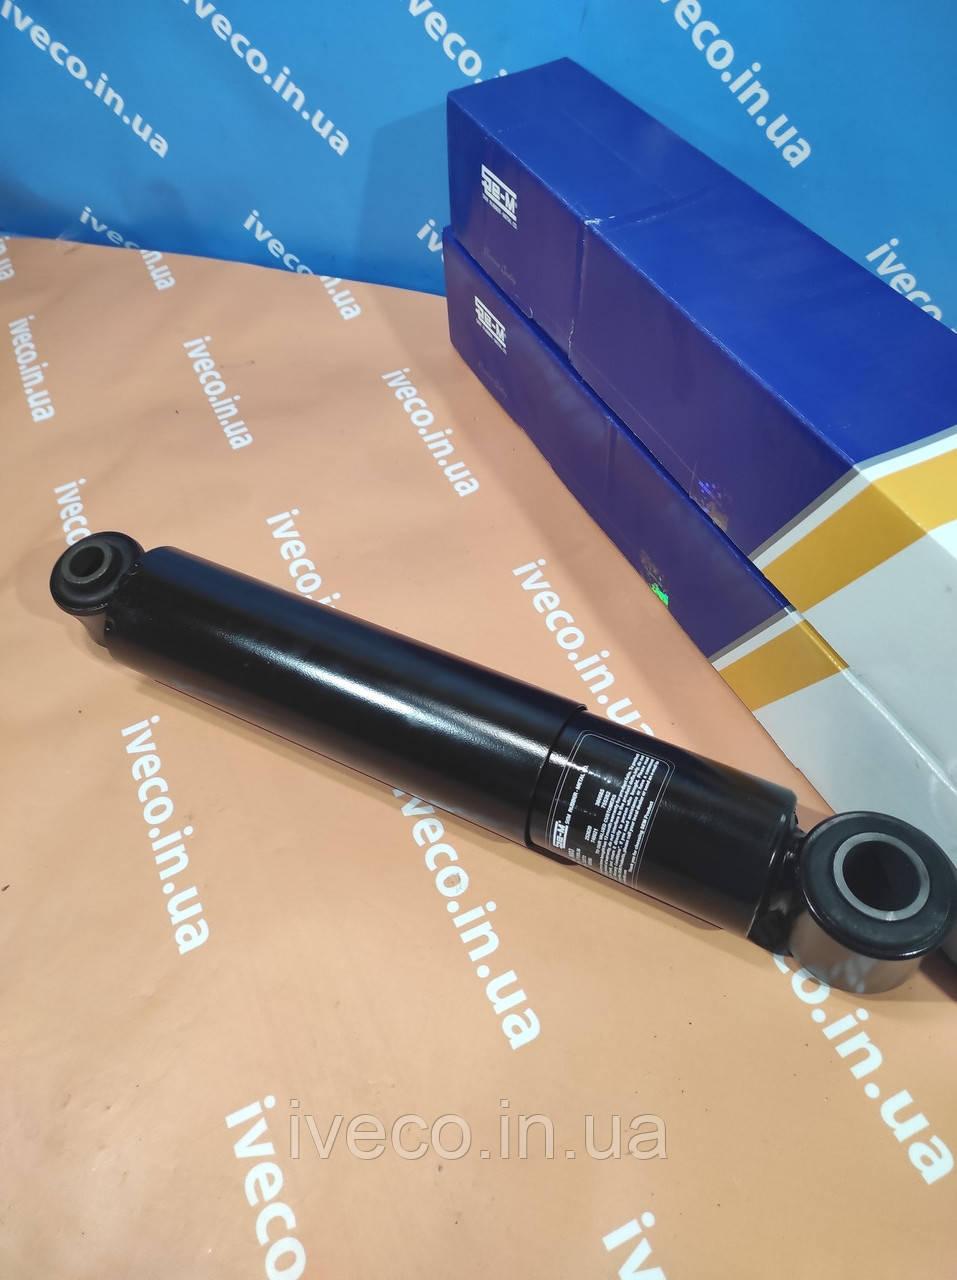 Амортизатор MAN F2000 F90 TGA DAF 65 75 85 95 95XF SEM9598 81437016564 81437016584 81437016620 1282632